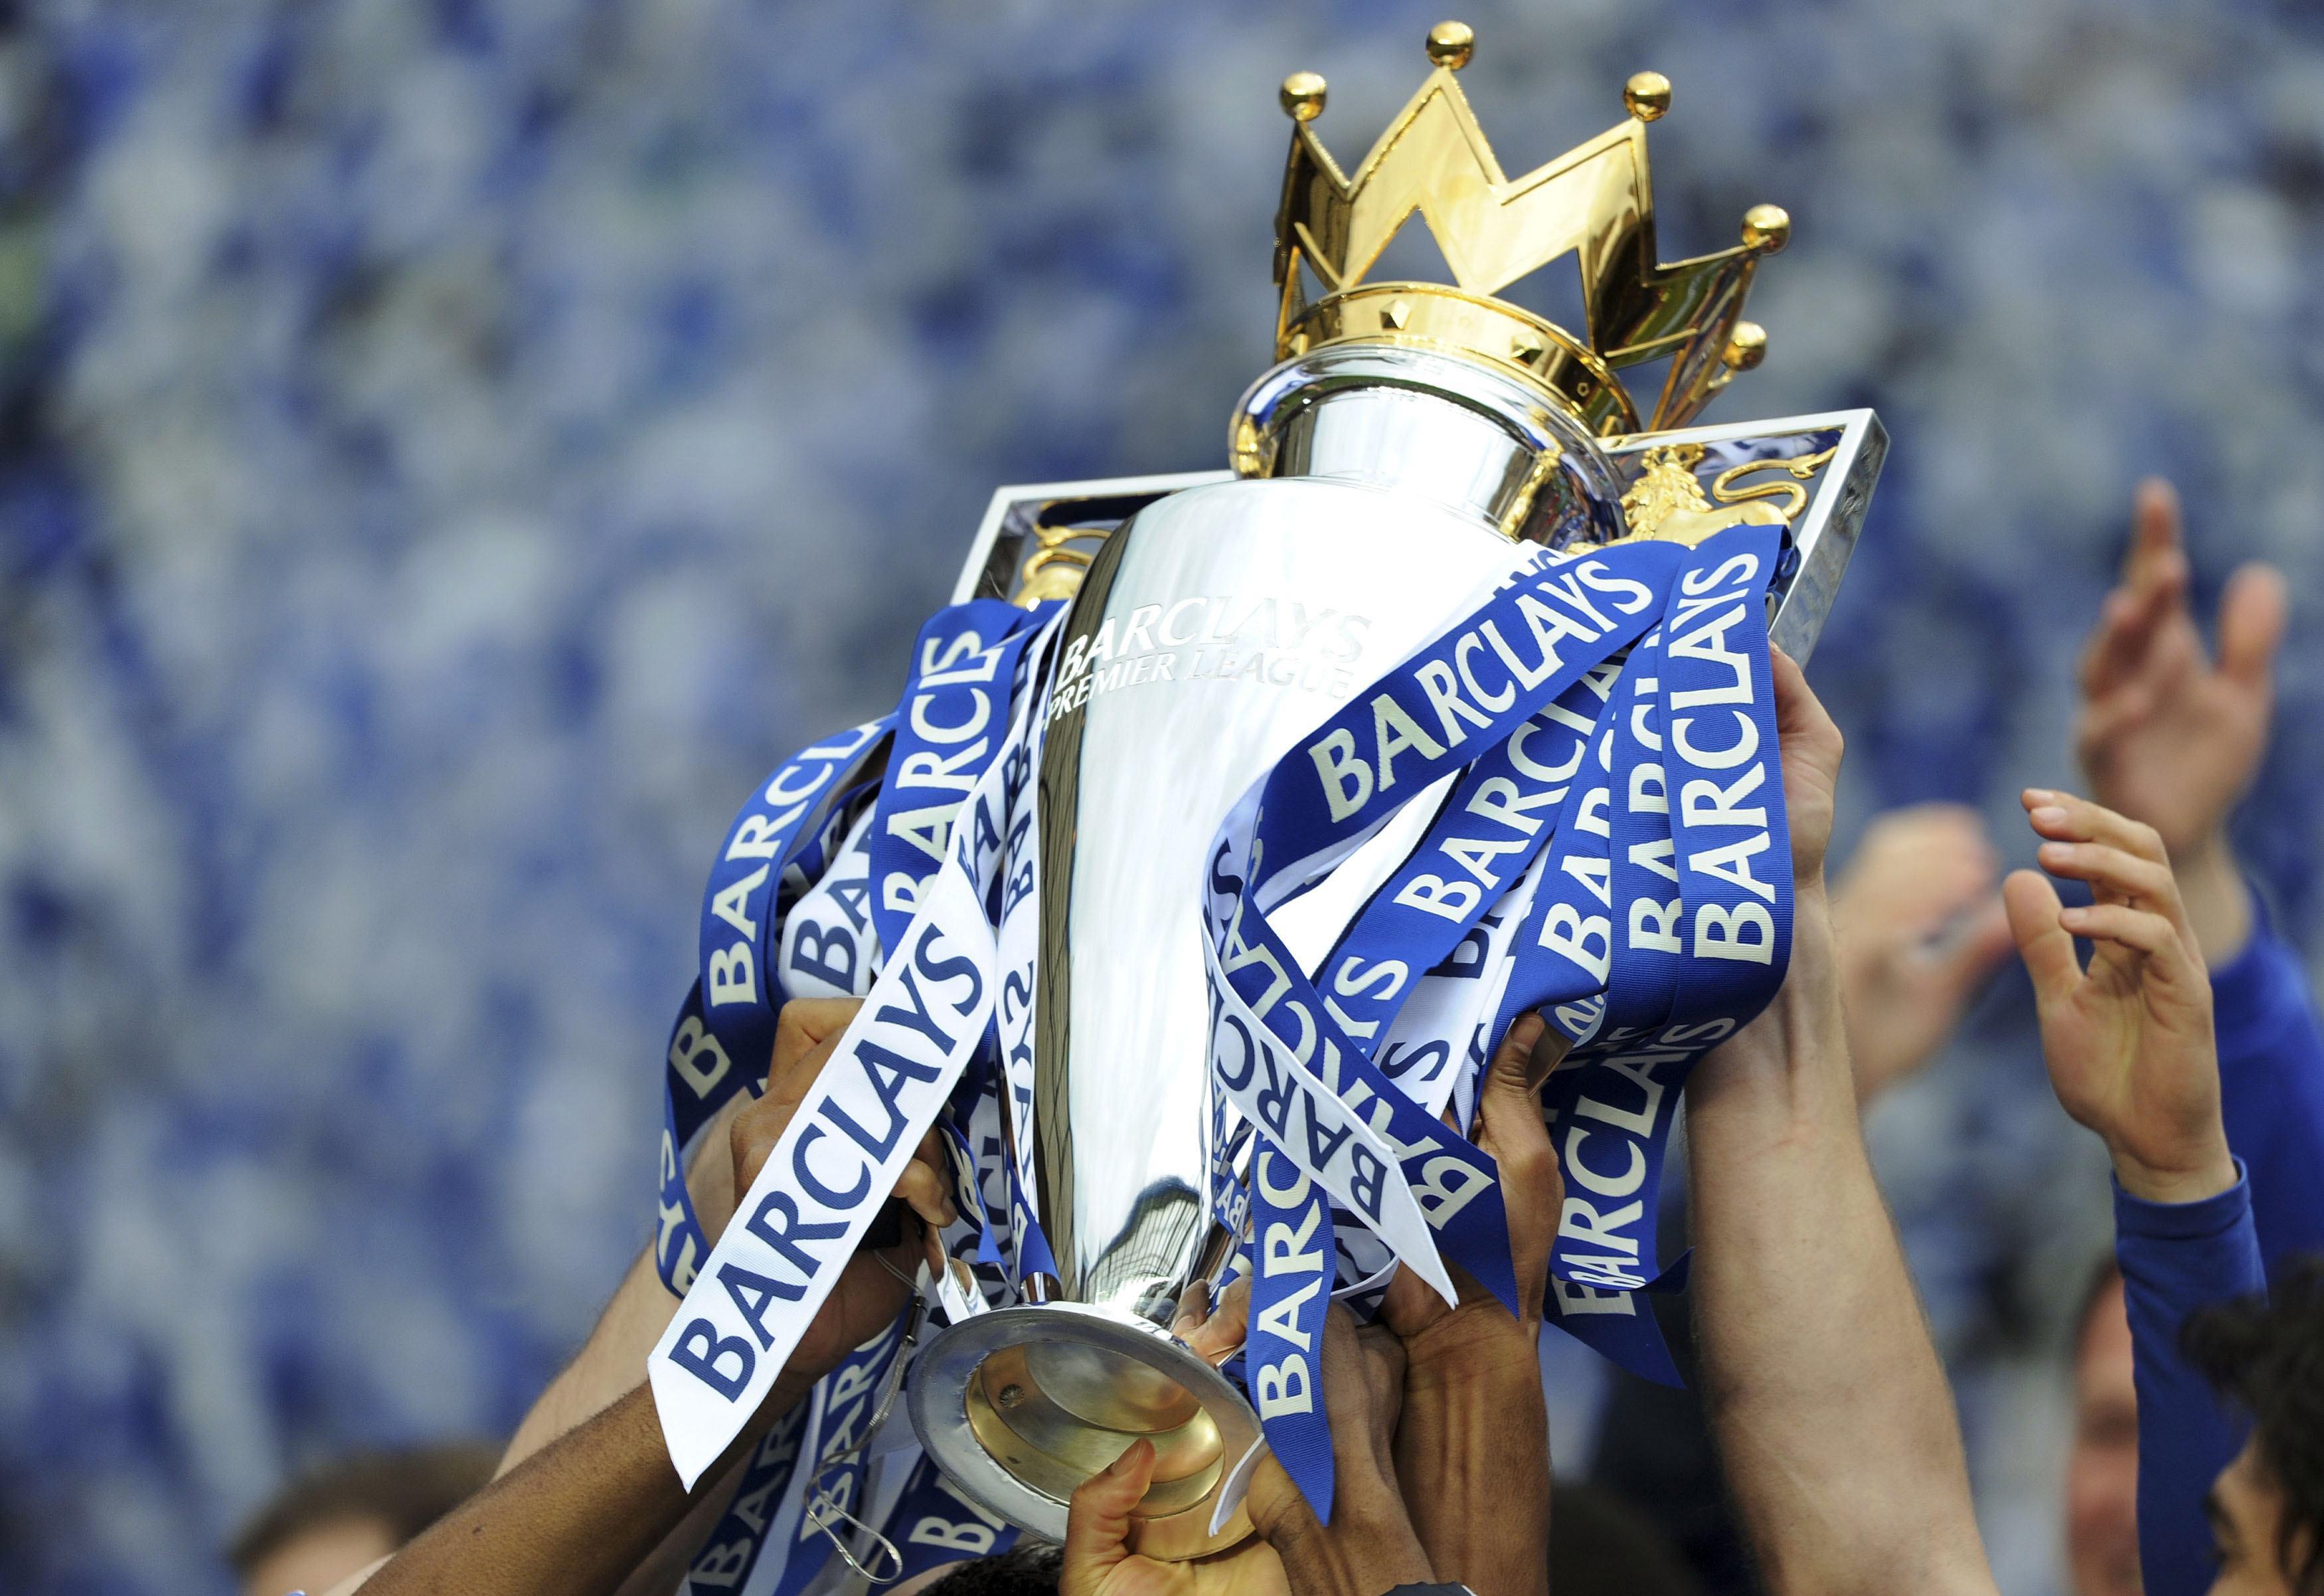 The Best Performing Midfielder In Europe Is In The Premier League